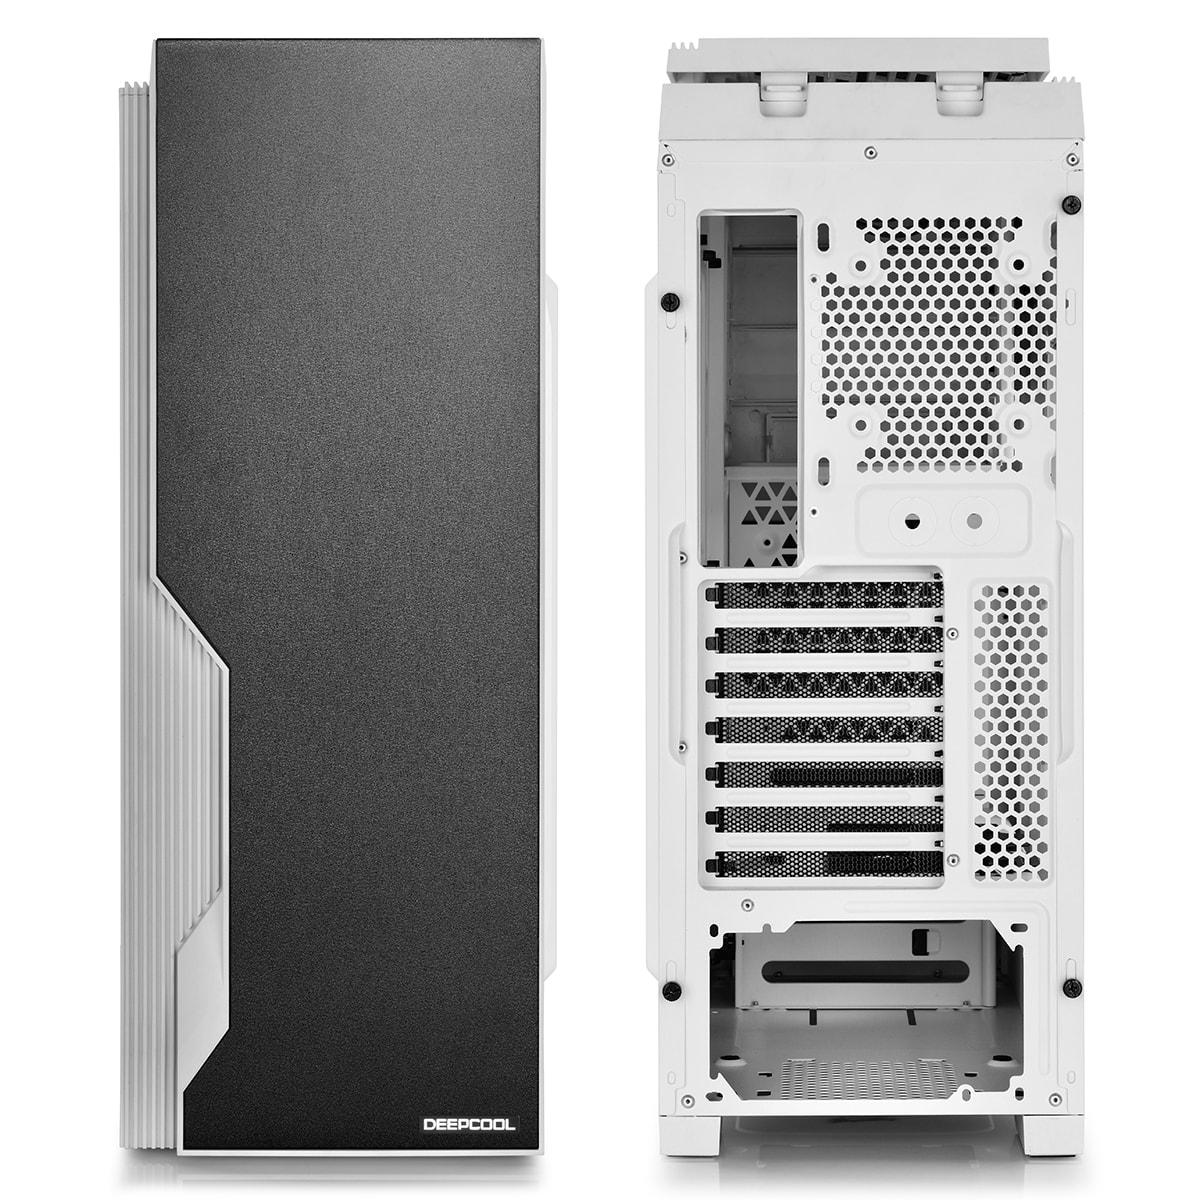 Deepcool DUKASE V2 Blanc - mT/Ss Alim/ATX (DUKASE WHV2) - Achat / Vente Boîtier PC sur Cybertek.fr - 4